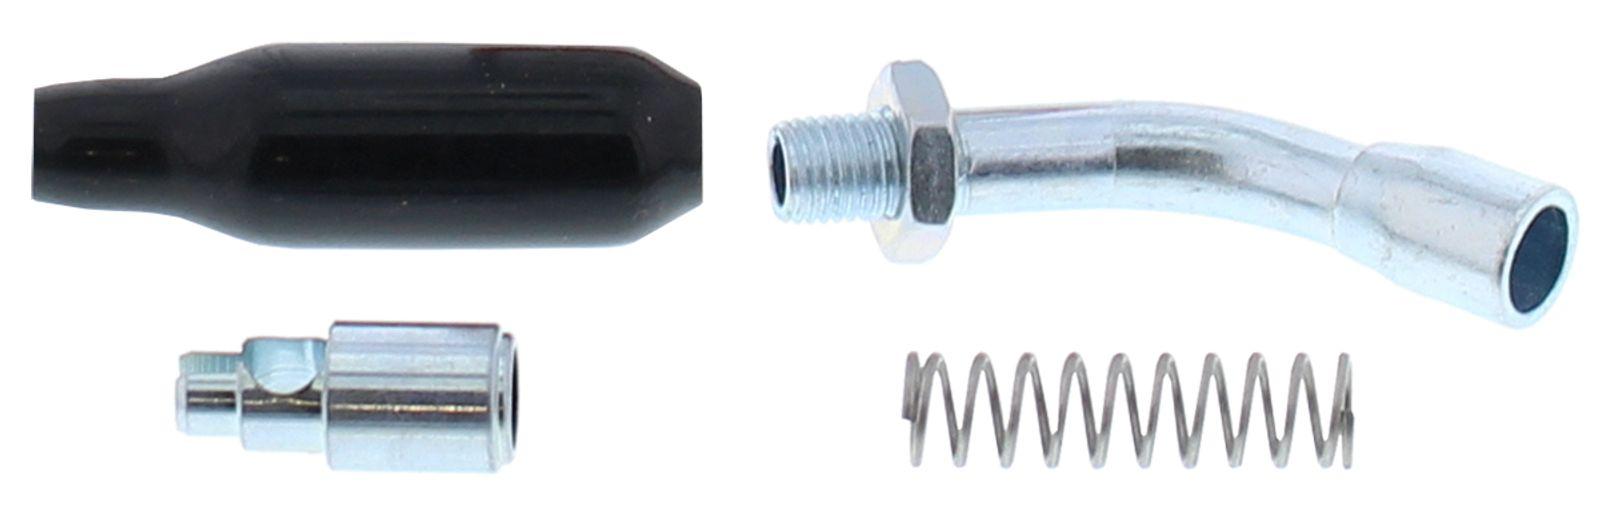 Wrp Choke Plunger Kits - WRP461004 image